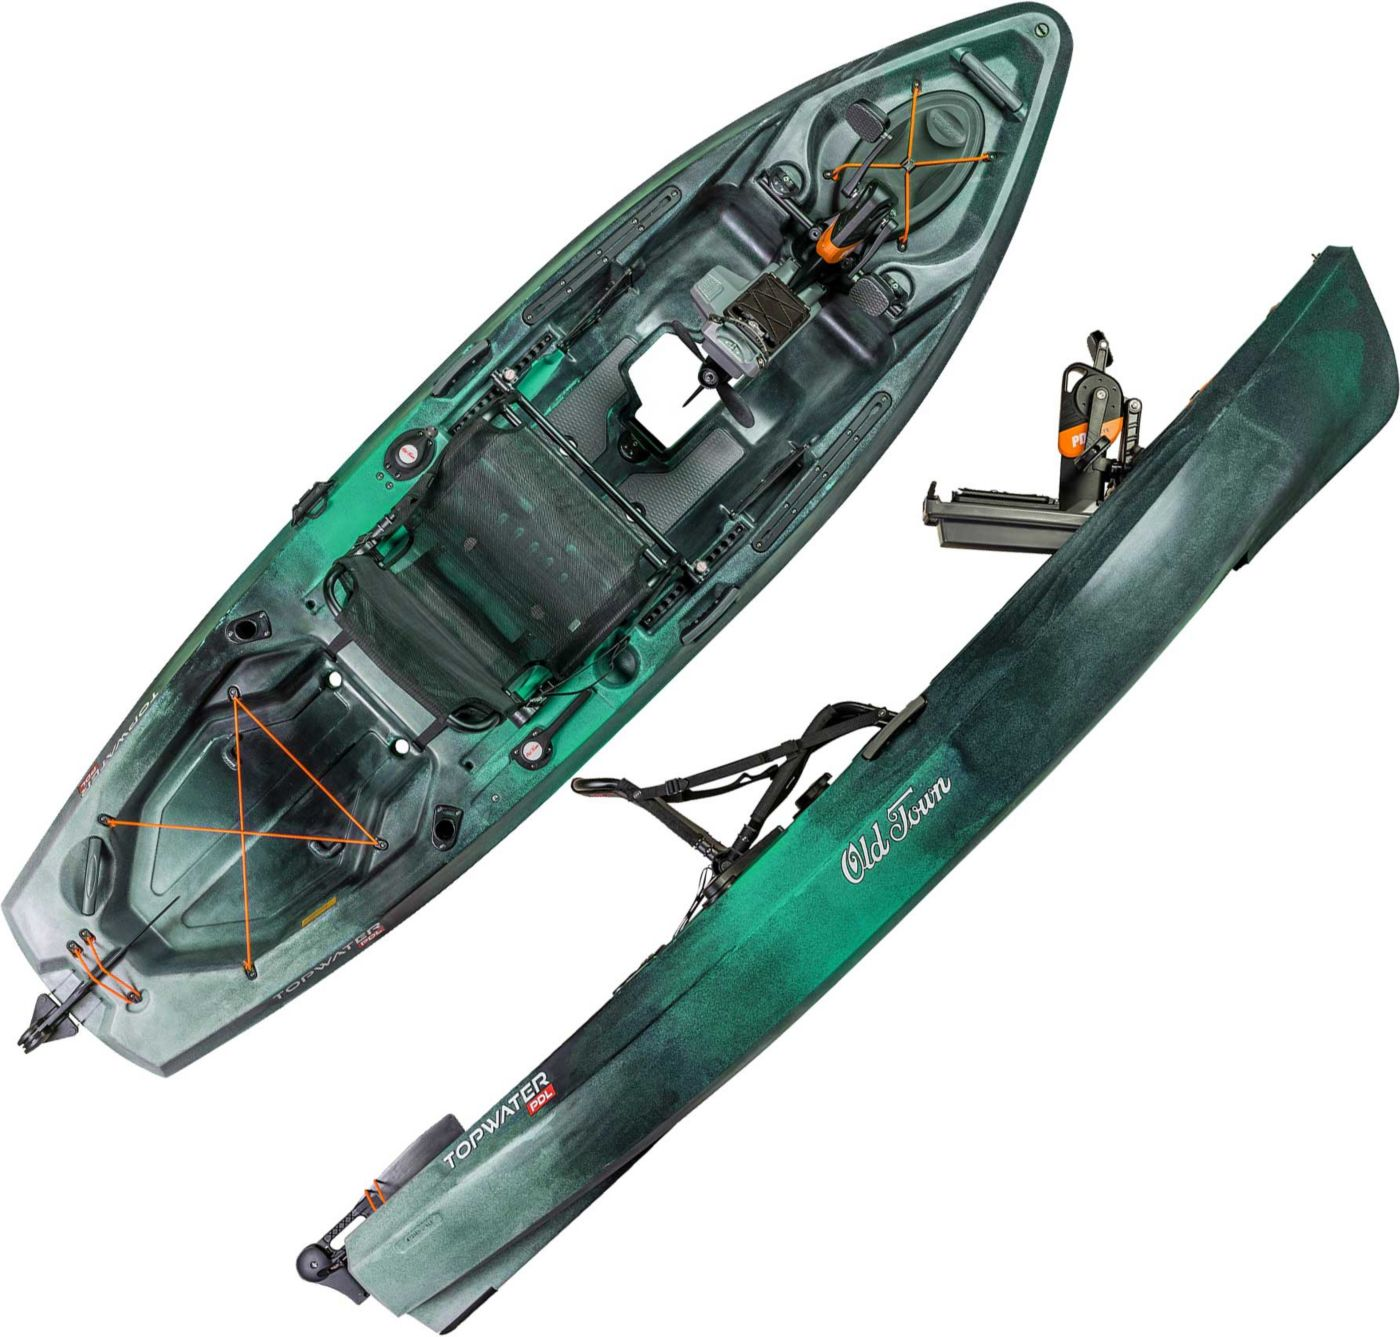 Old Town Topwater 106 PDL Angler Kayak